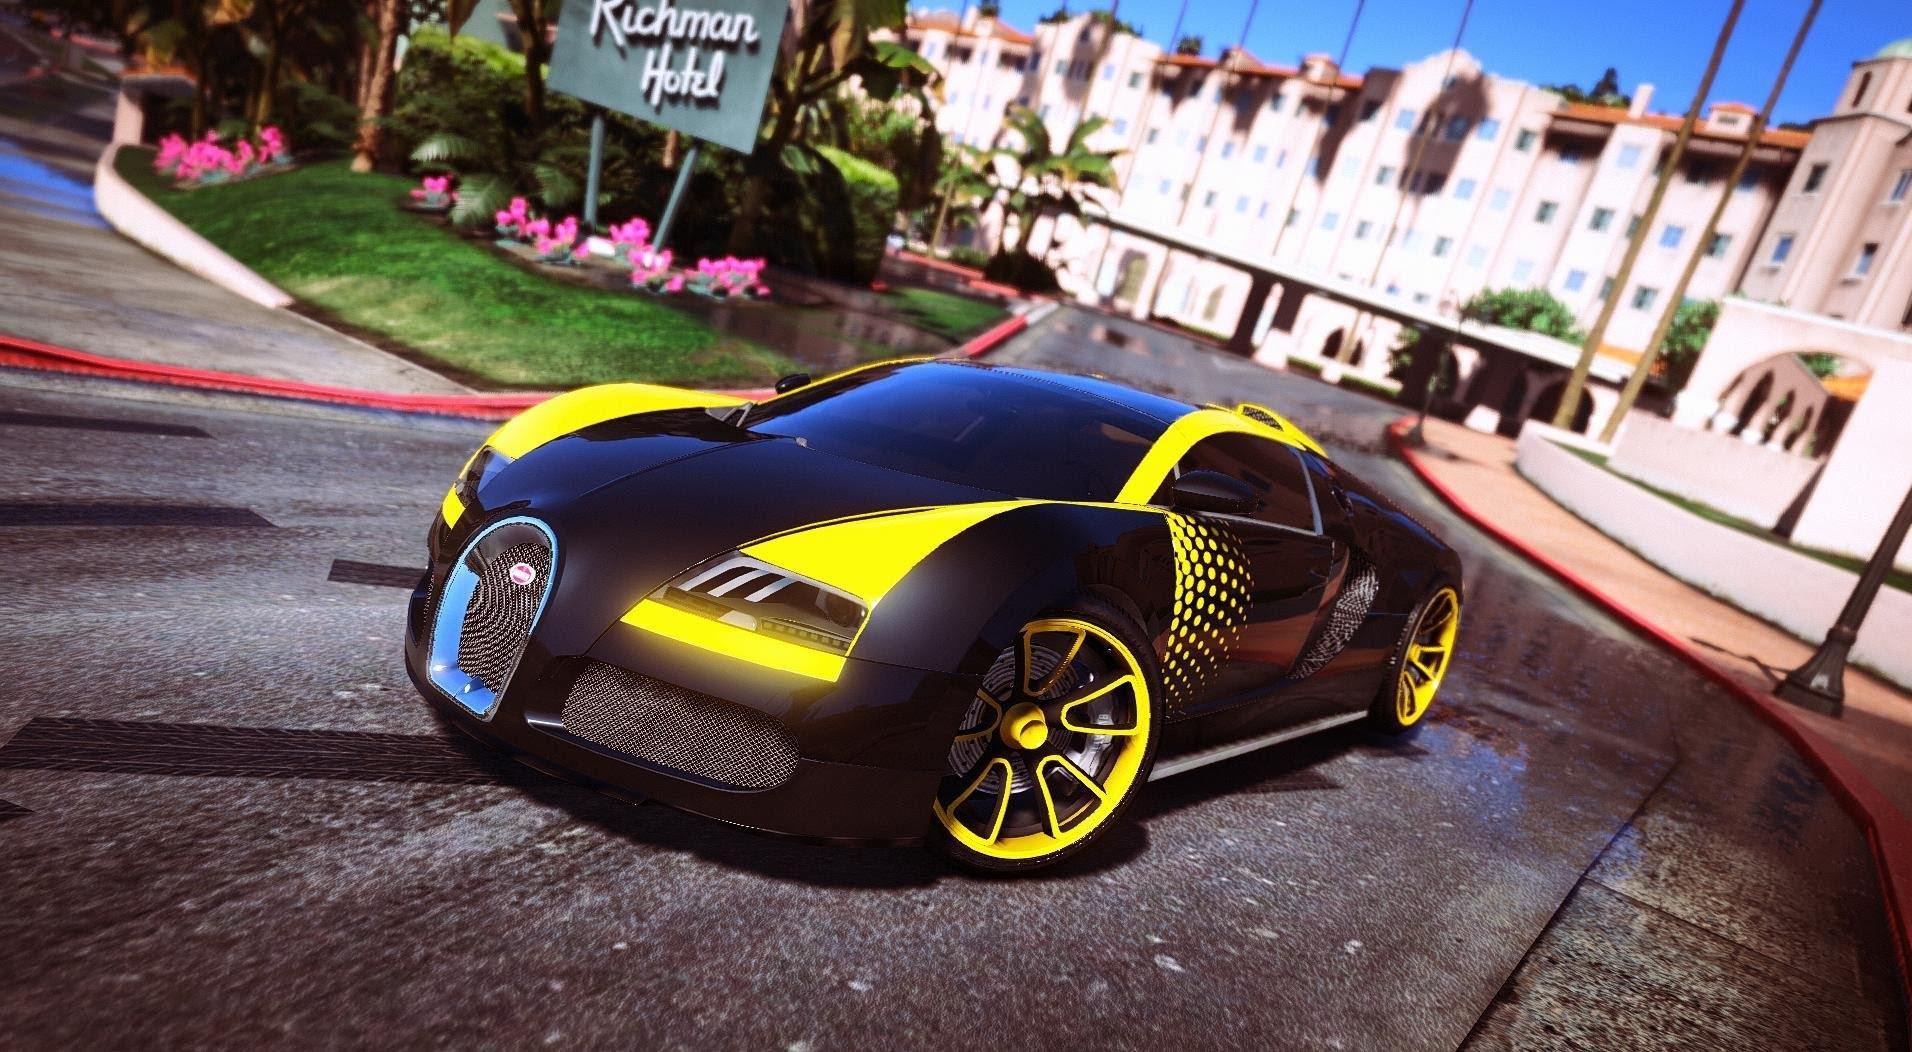 Gta 5 cars adderbugatti t20 tips for games gta 5 cars adderbugatti t20 voltagebd Images